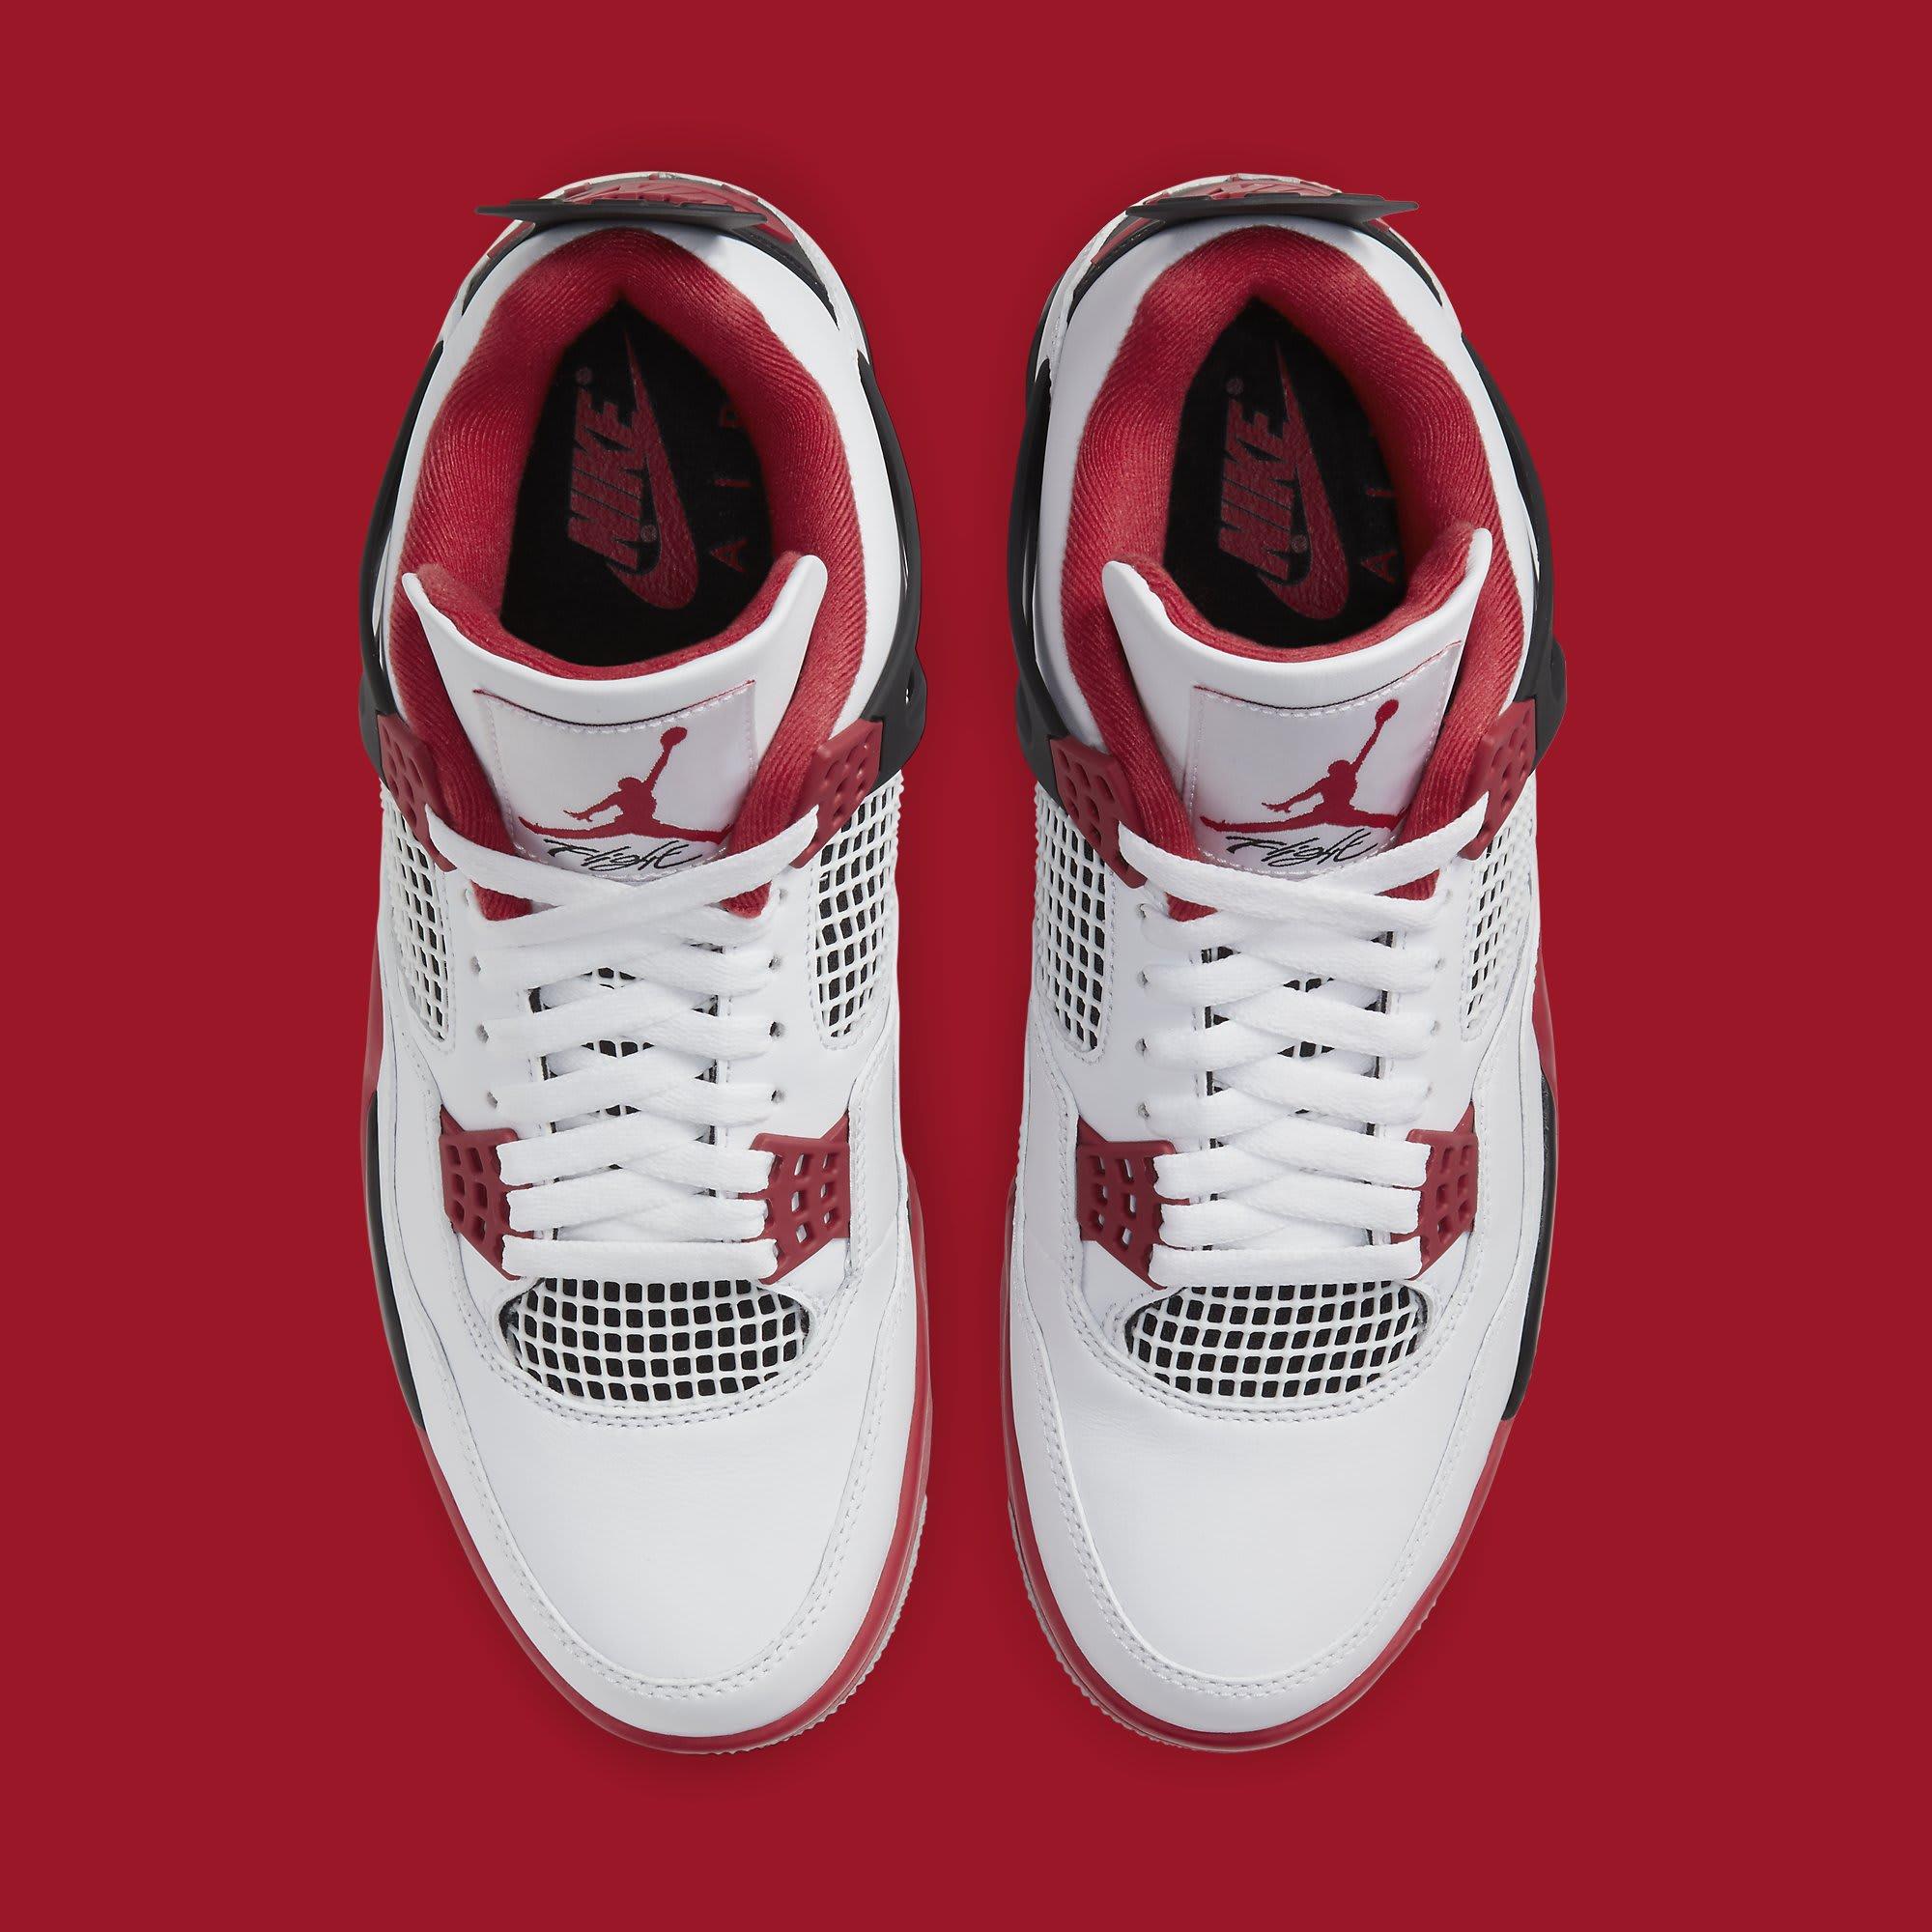 Air Jordan 4 IV Fire Red 2020 Release Date DC7770-160 Top